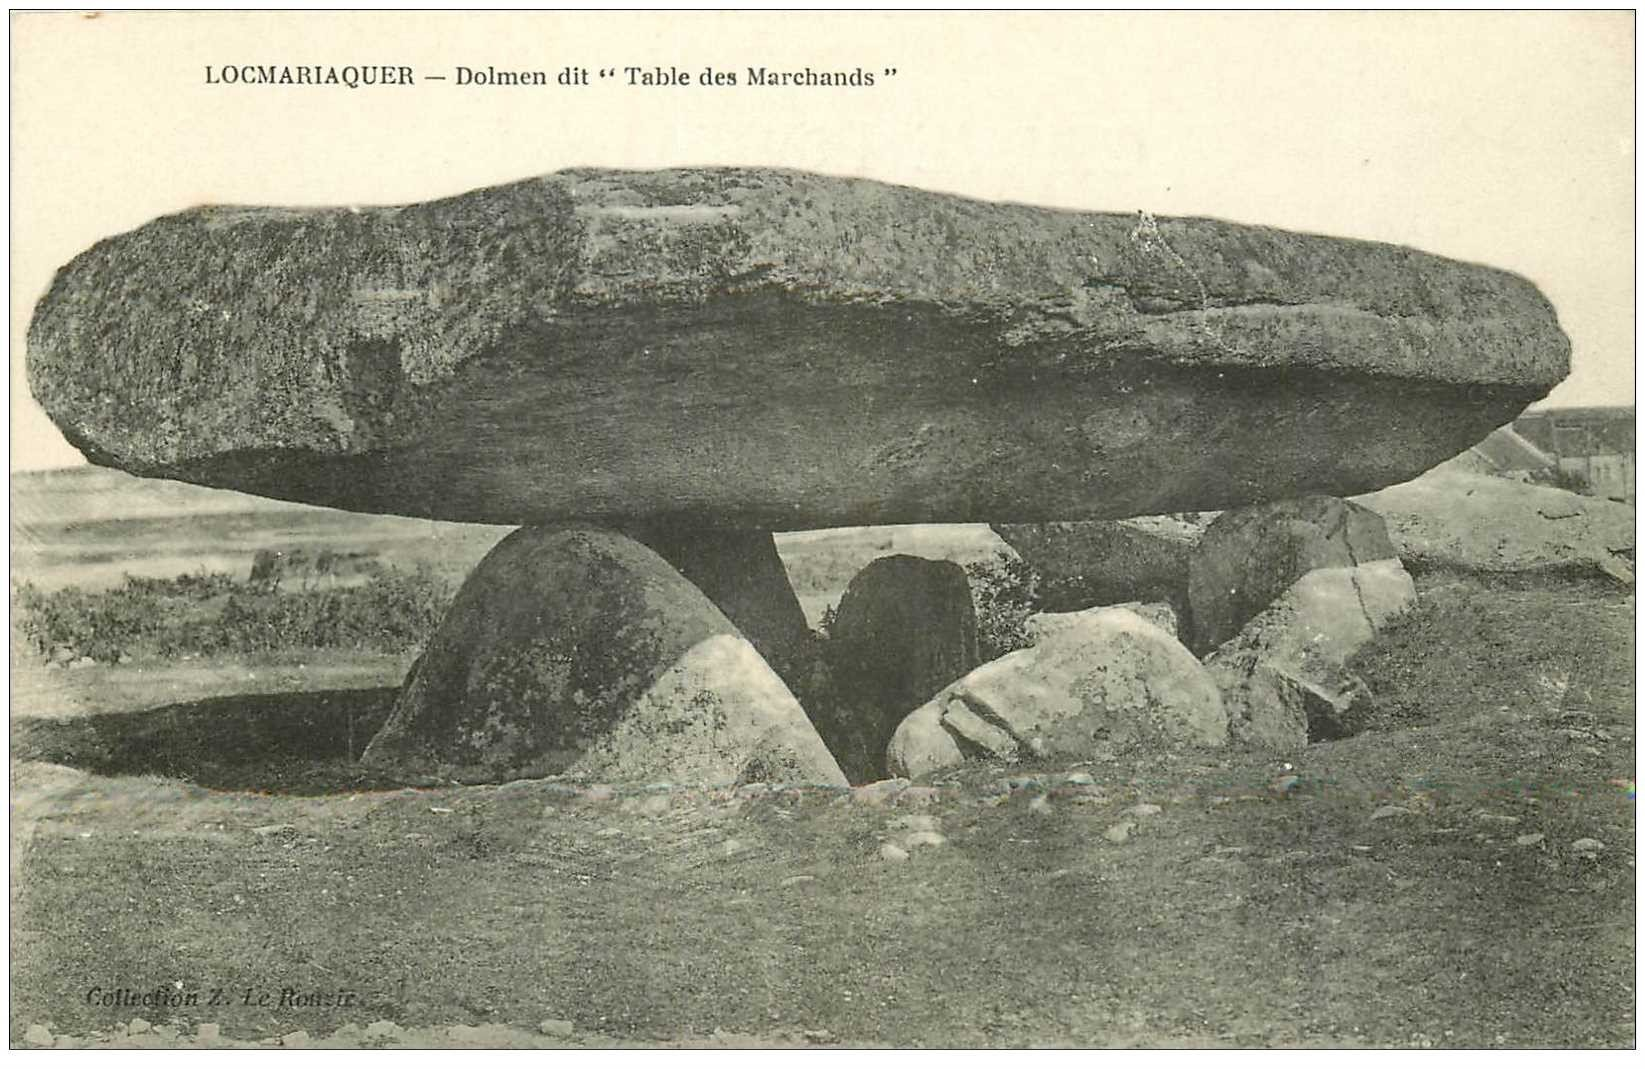 Dolmens et menhirs locmariaquer table des marchands - Locmariaquer table des marchands ...